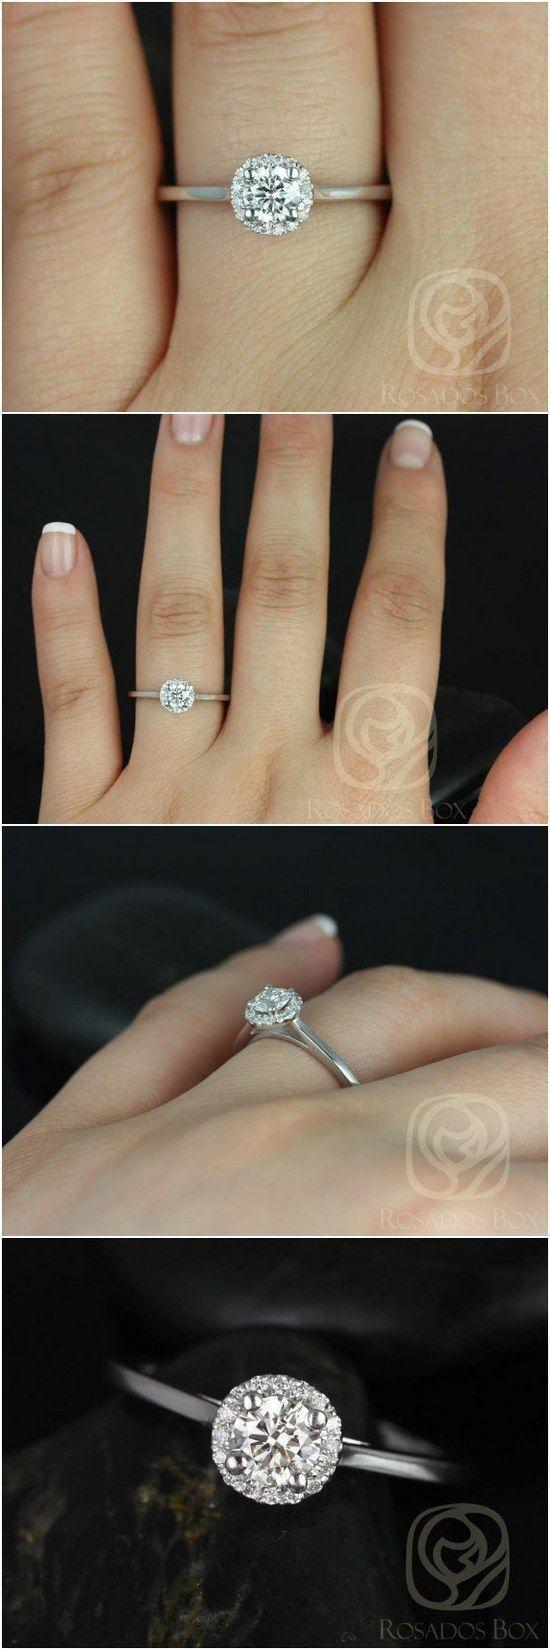 Top 25+ Best Inexpensive Wedding Rings Ideas On Pinterest  Inexpensive  Engagement Rings, Delicate Engagement Ring And Gold Wedding Rings